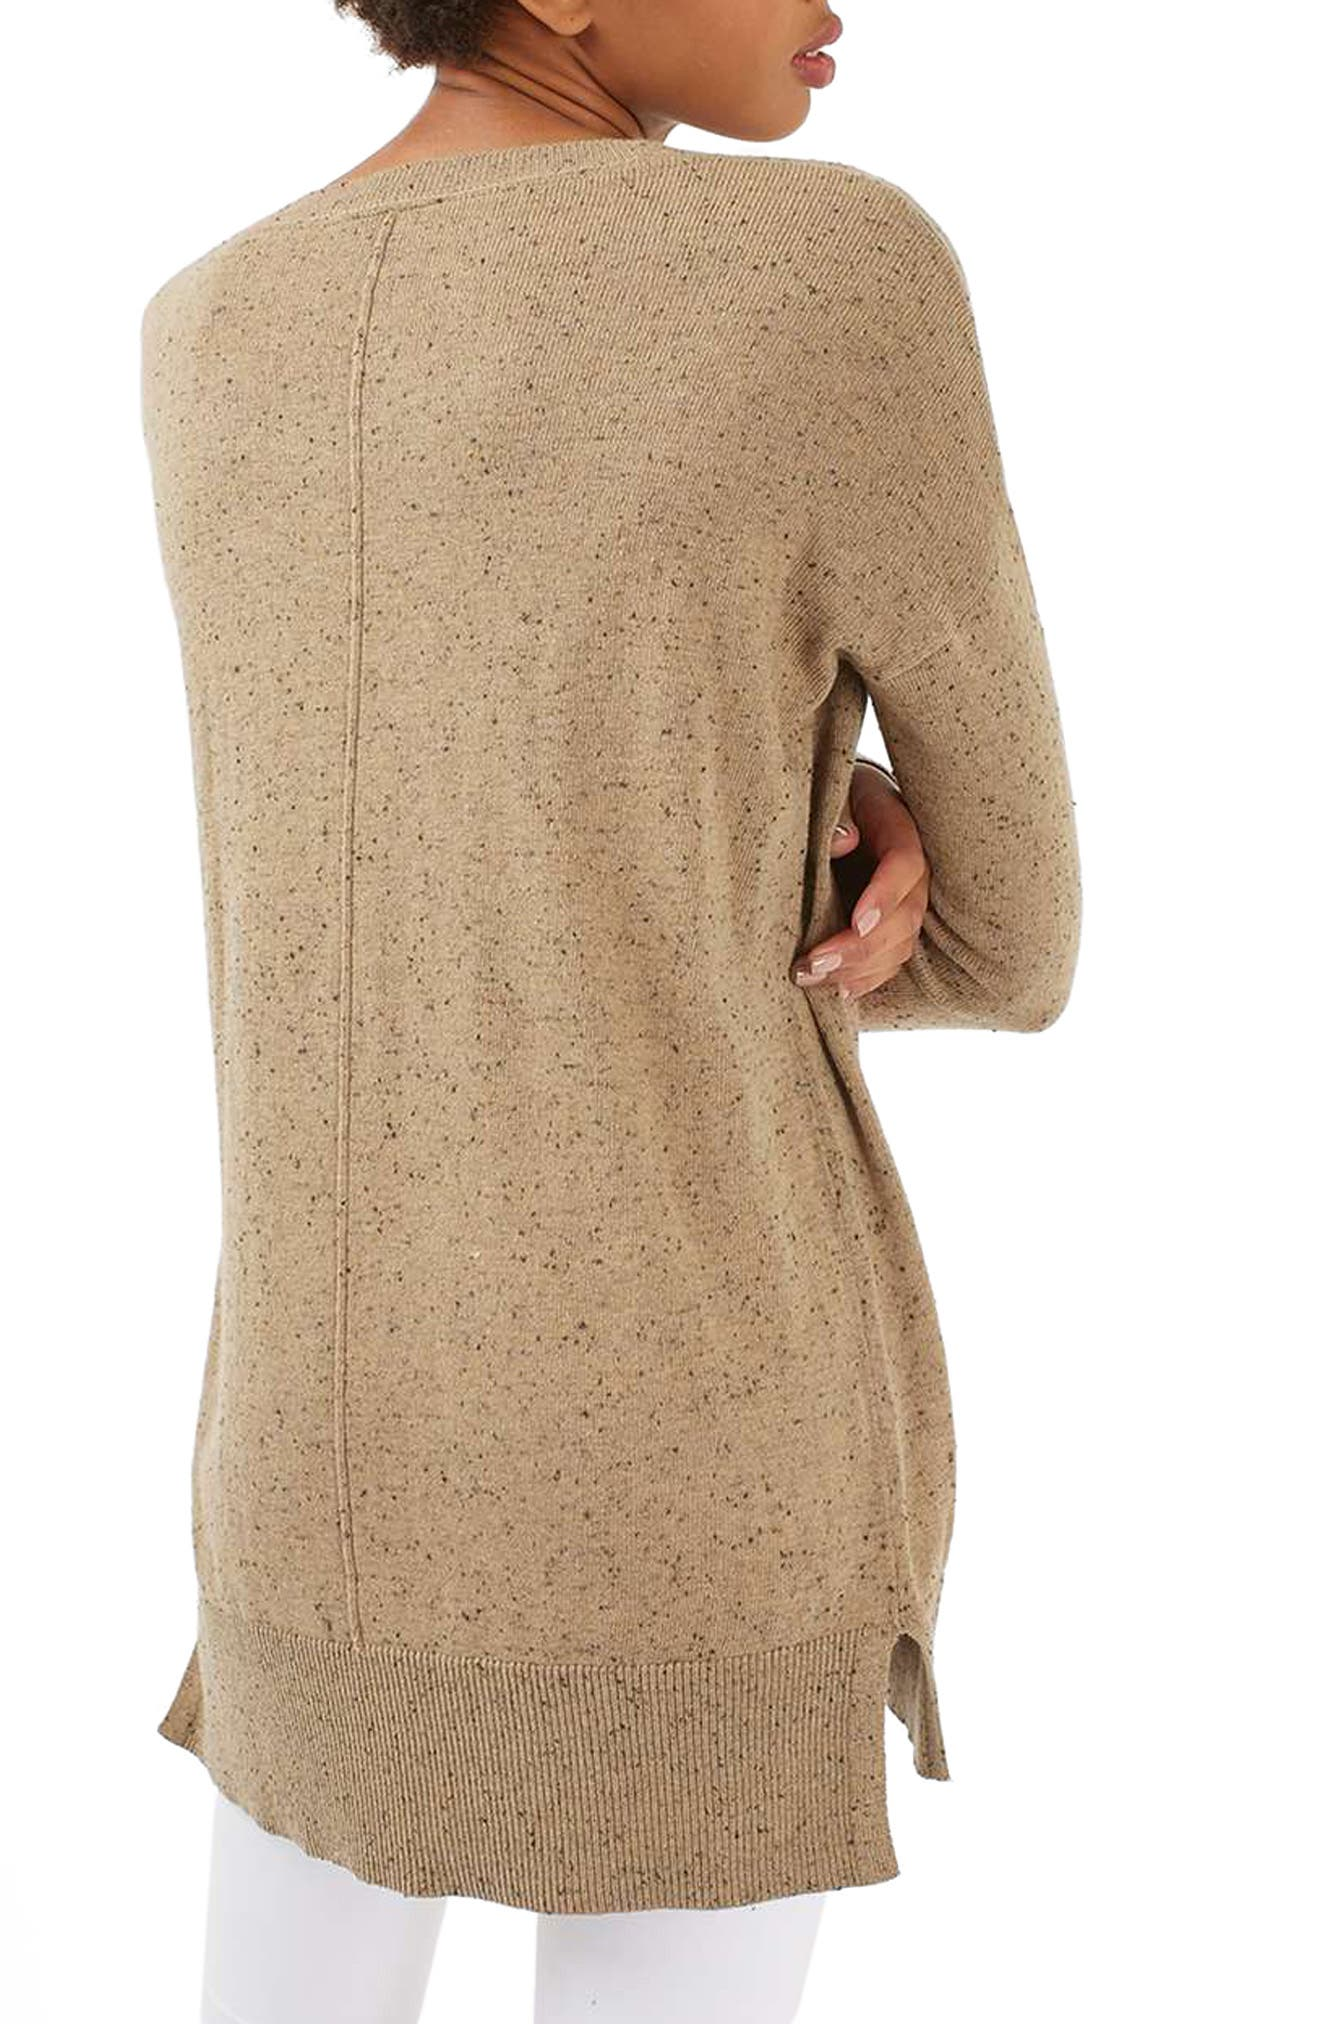 Lace V-Neck Sweater Tunic,                             Alternate thumbnail 3, color,                             230